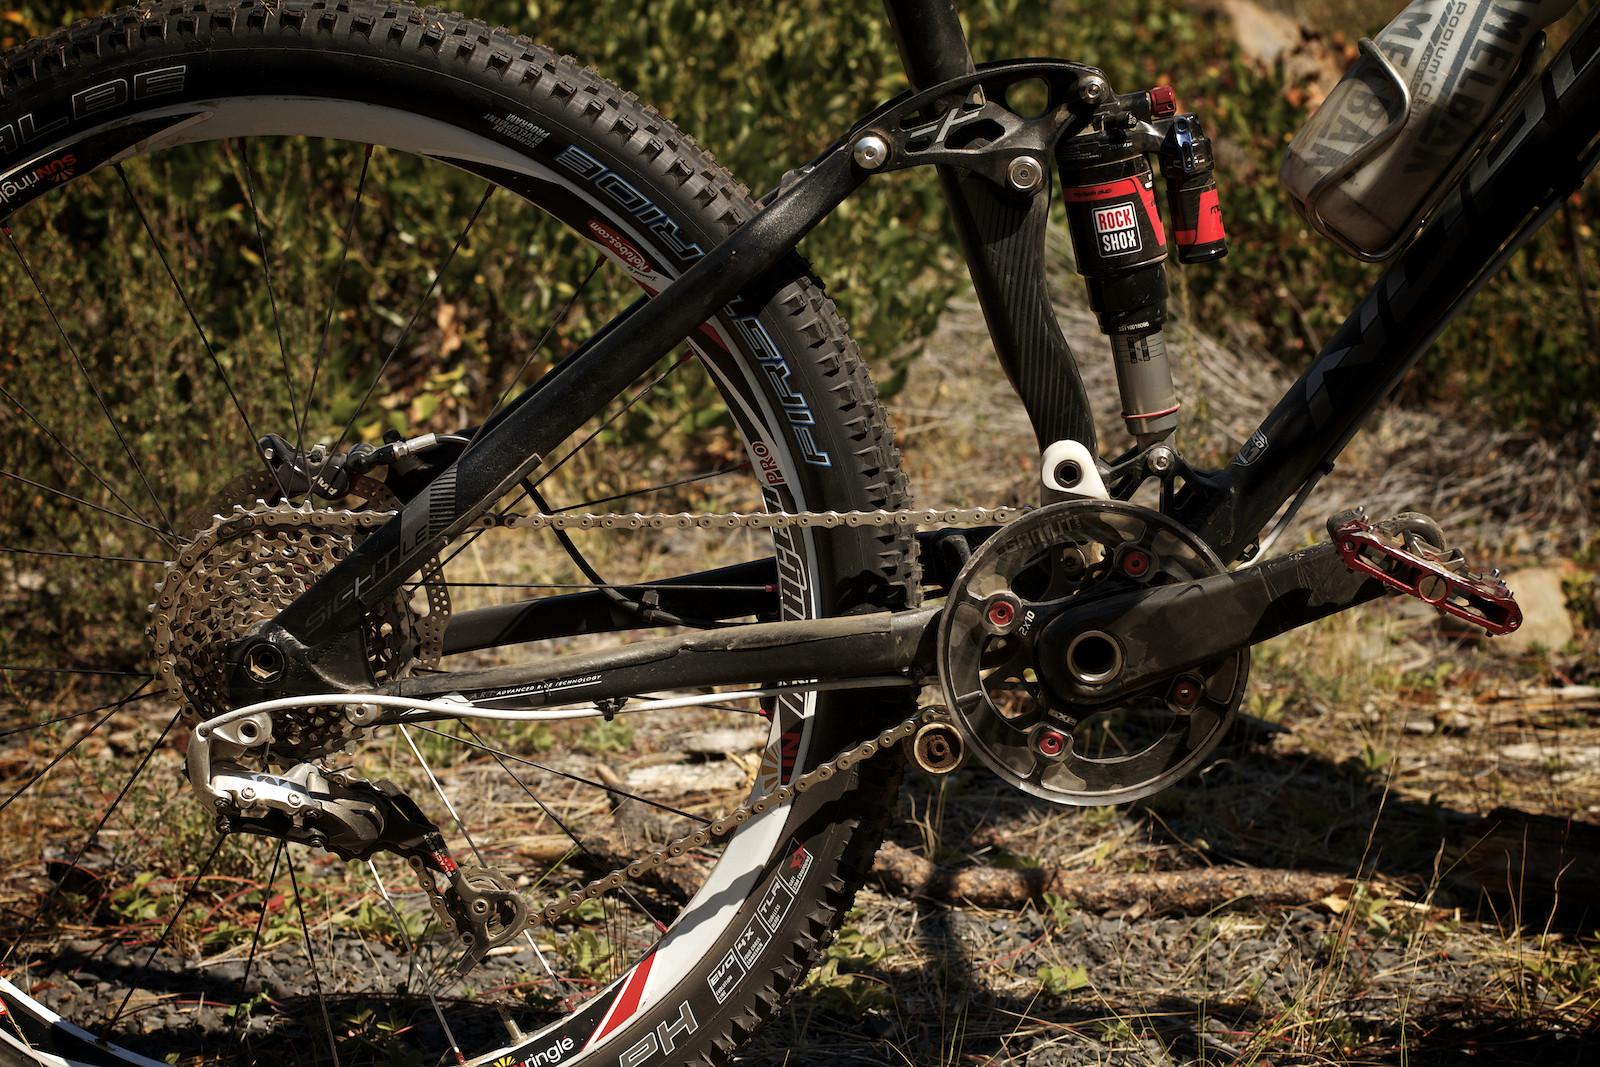 Duncan Riffle's Norco Sight Drivetrain - corytepper.com - Mountain Biking Pictures - Vital MTB